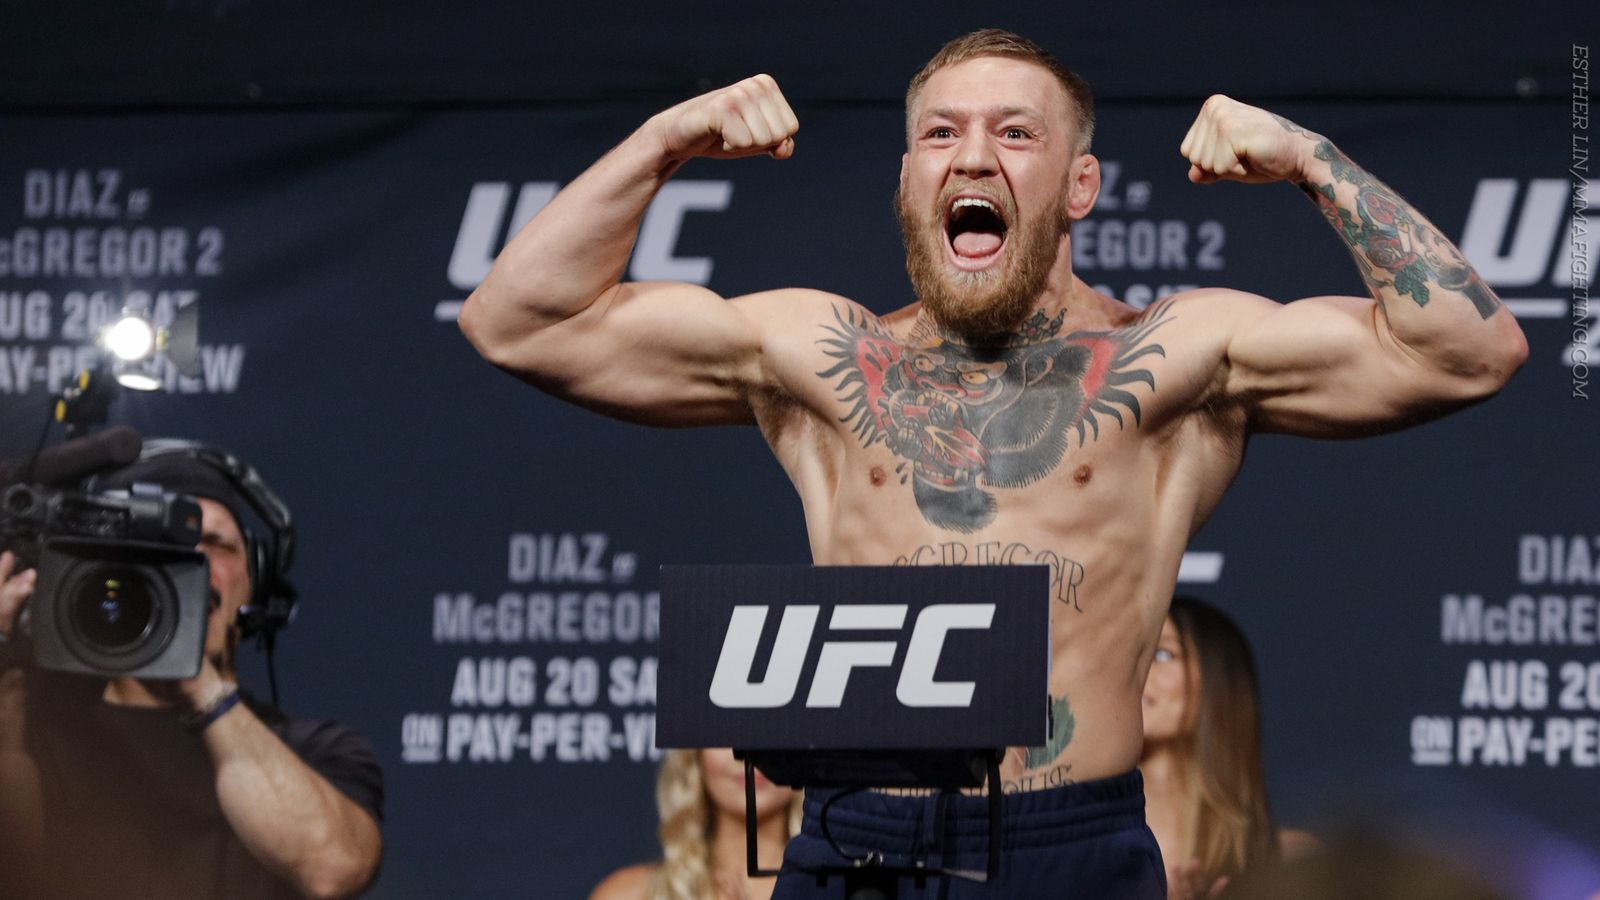 UFC 202 live stream online - MMA Fighting  UFC 202 live st...